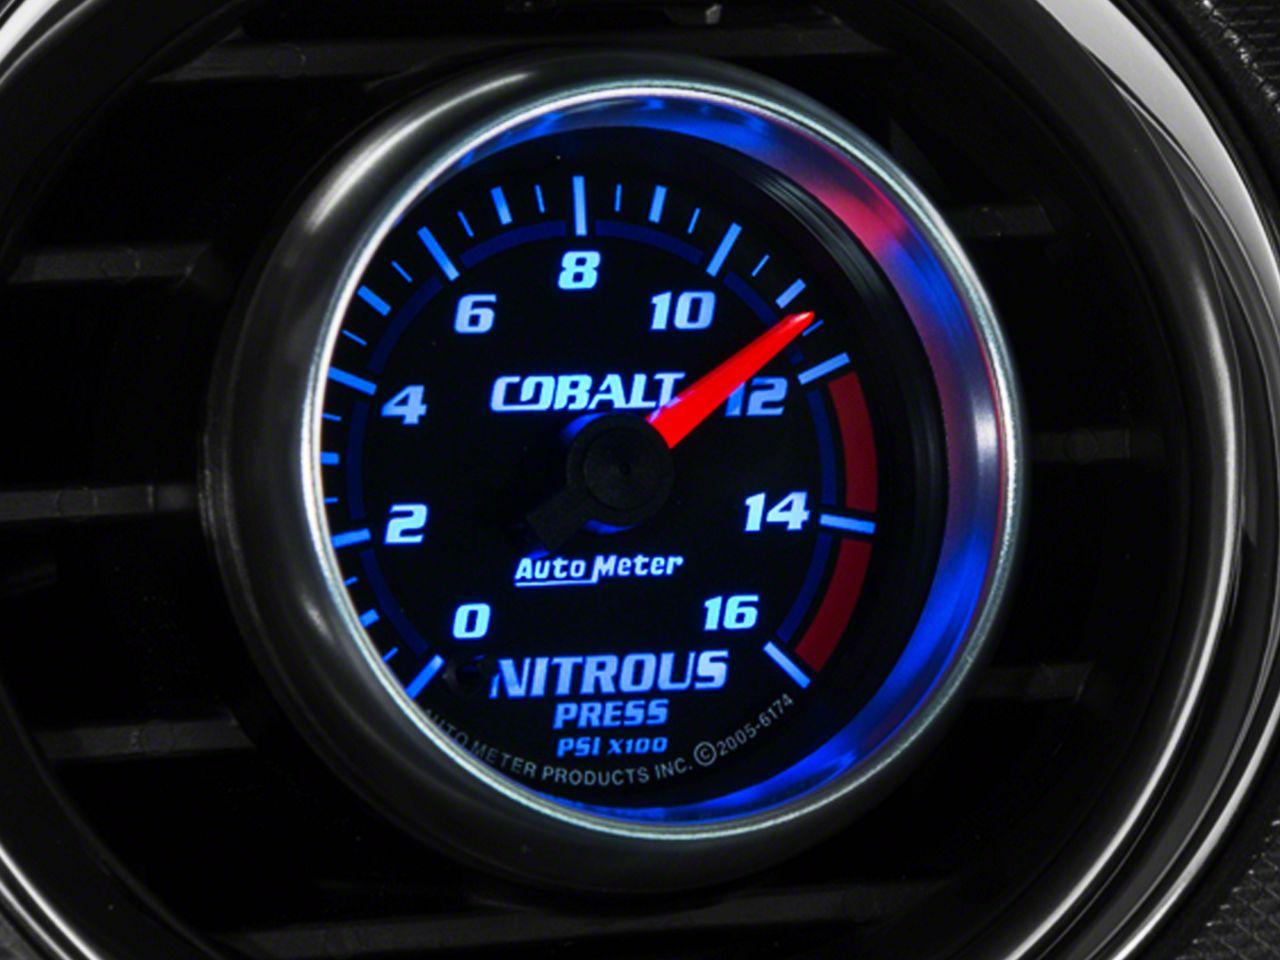 Auto Meter Cobalt Nitrous Pressure Gauge - Electrical (08-18 All)